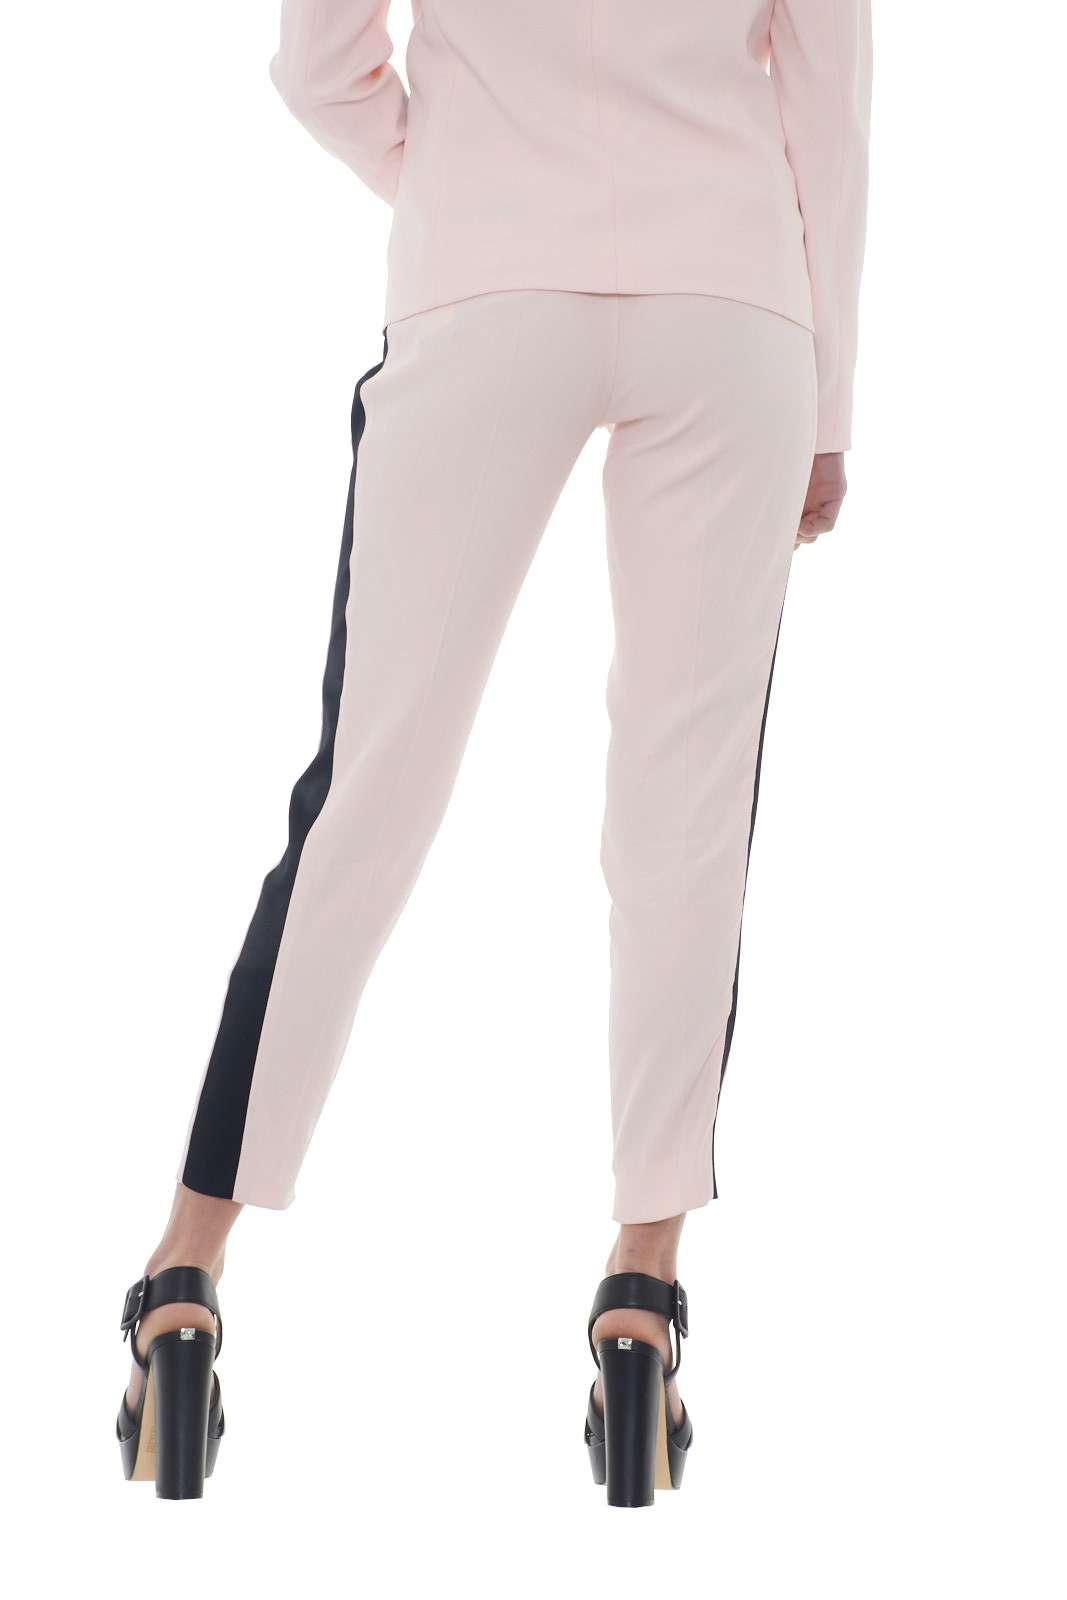 https://www.parmax.com/media/catalog/product/a/i/PE-outlet_parmax-pantaloni-donna-Liu-Jo-i18076-C.jpg